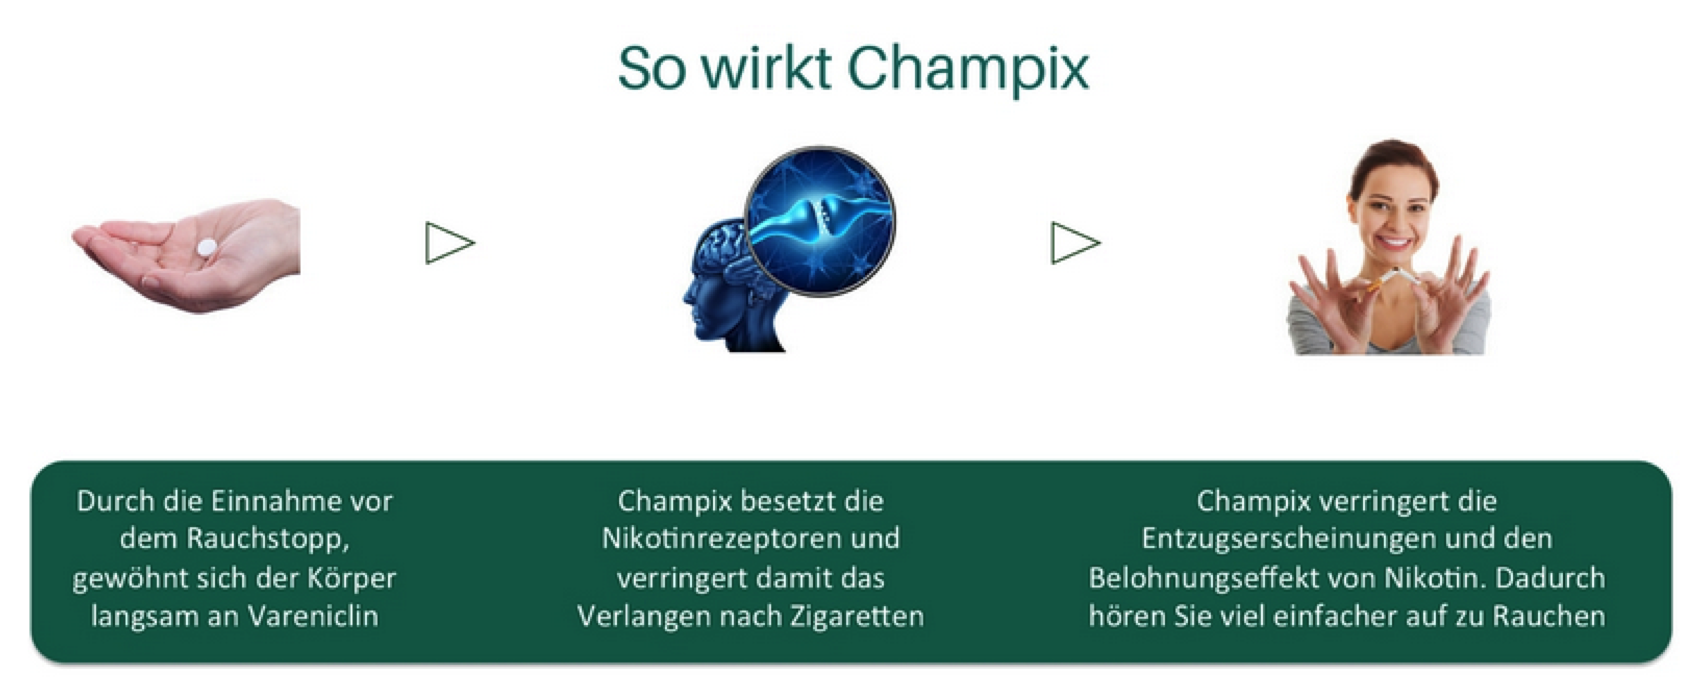 champix wirkung